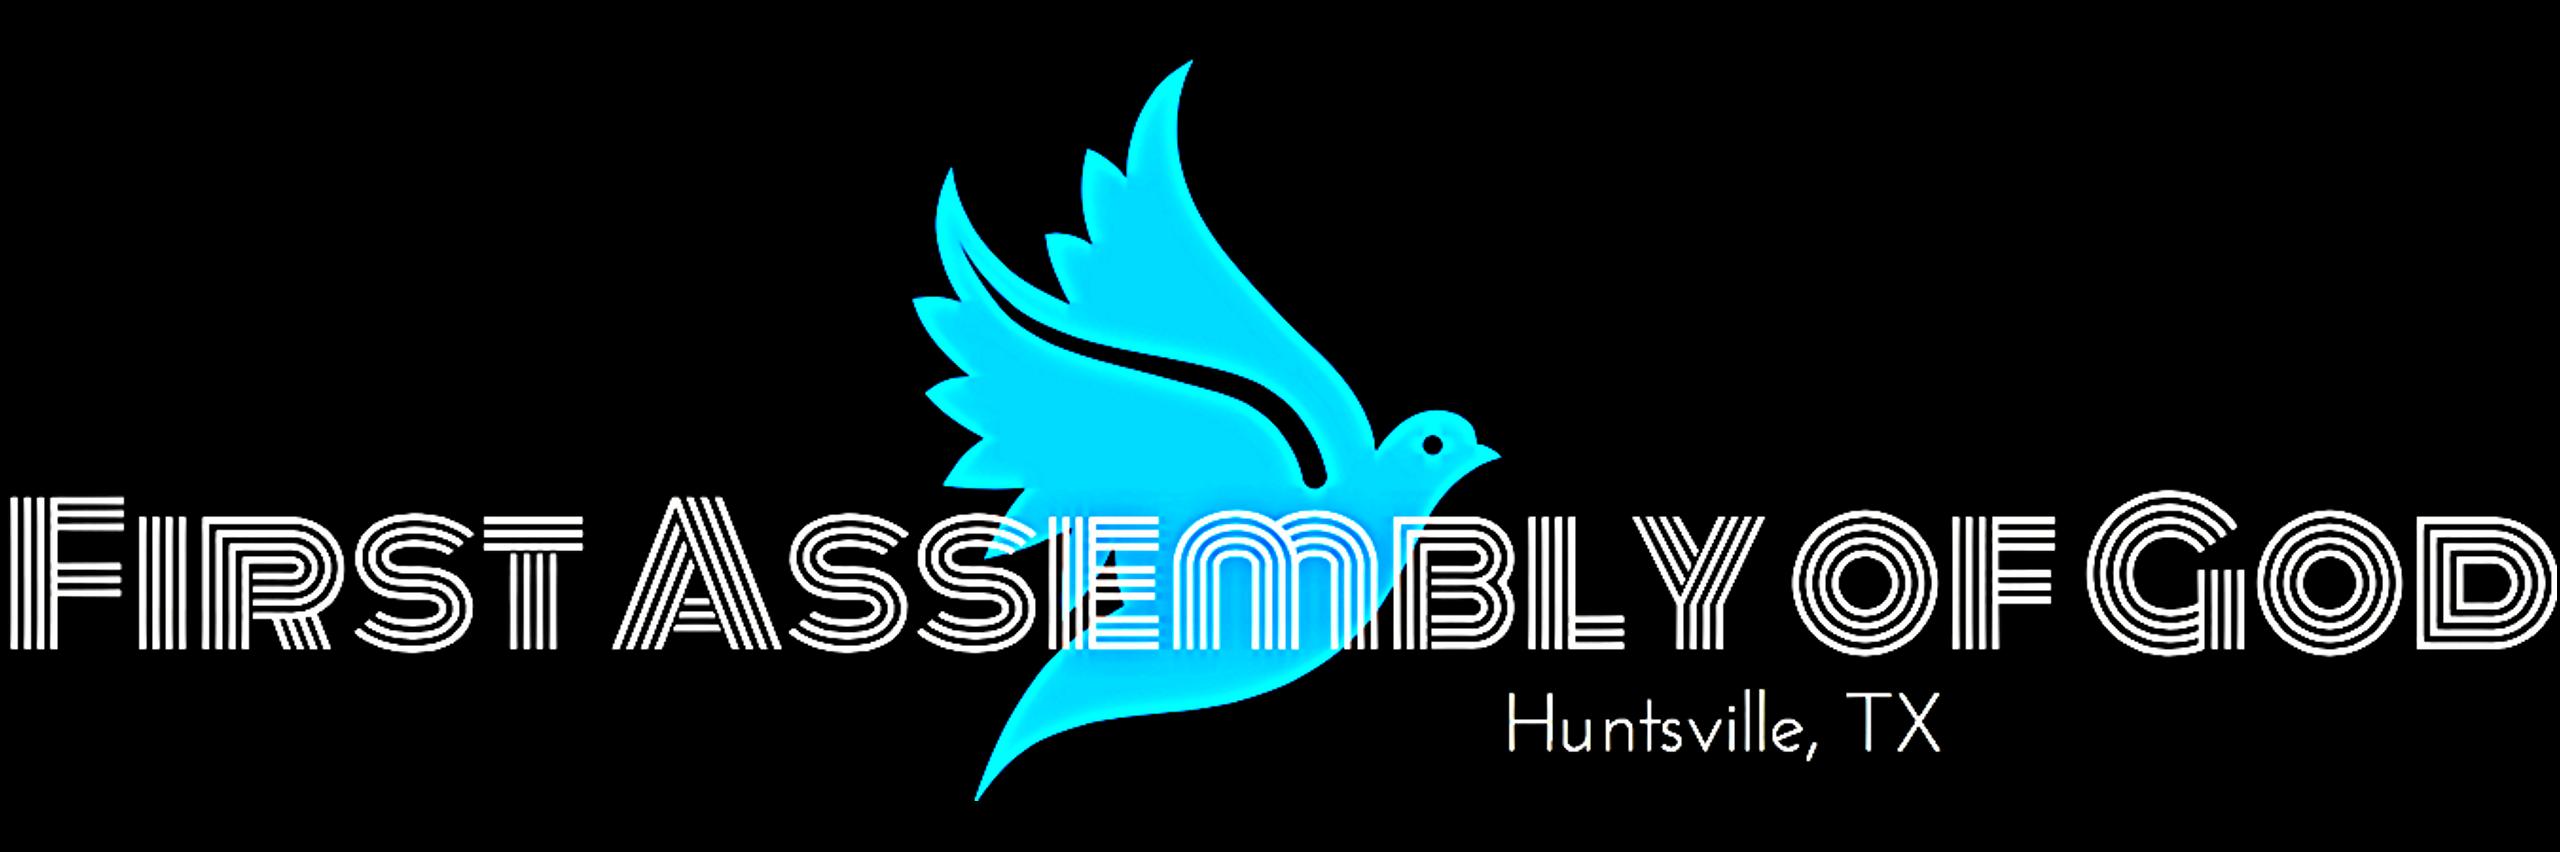 First Assembly of God Huntsville